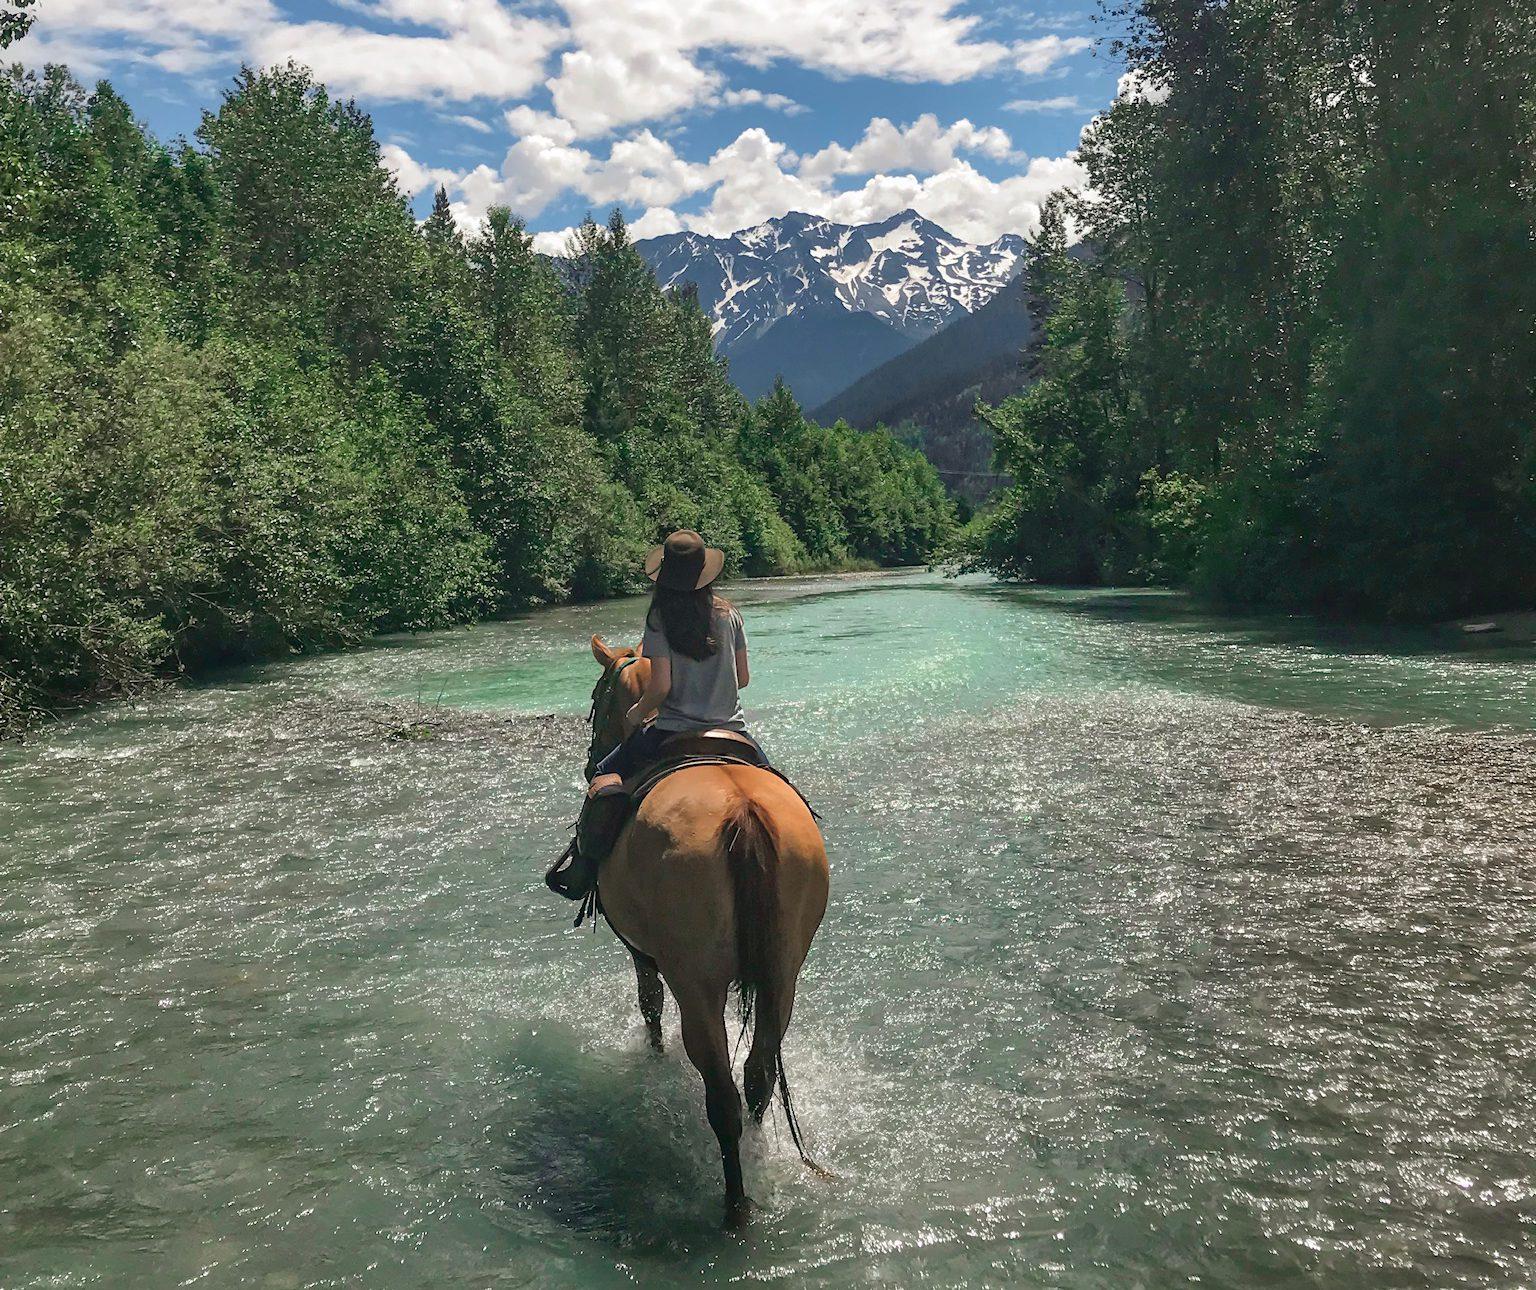 One hour Pemberton horse riding experience near Whistler, Canada